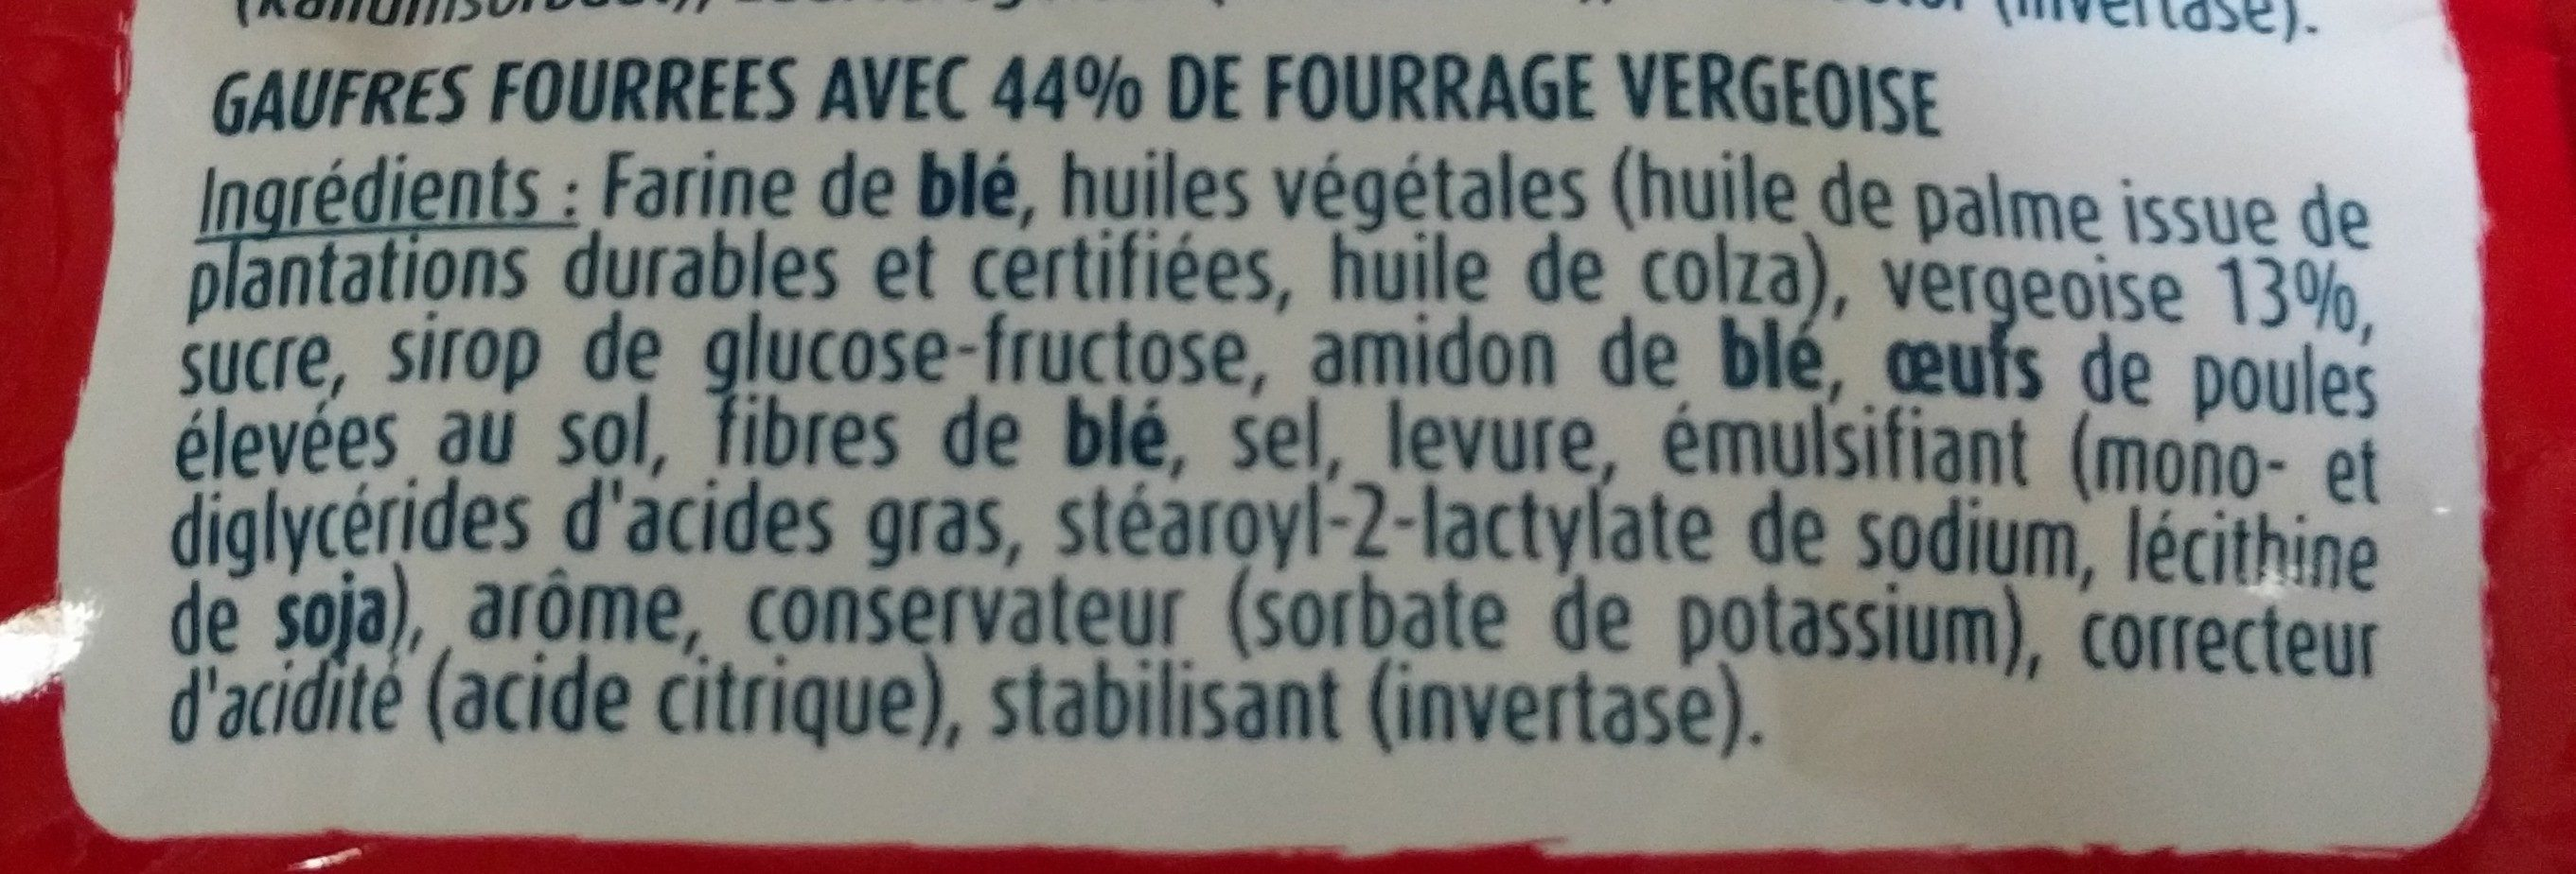 Gaufres vergeoise - Ingrediënten - fr